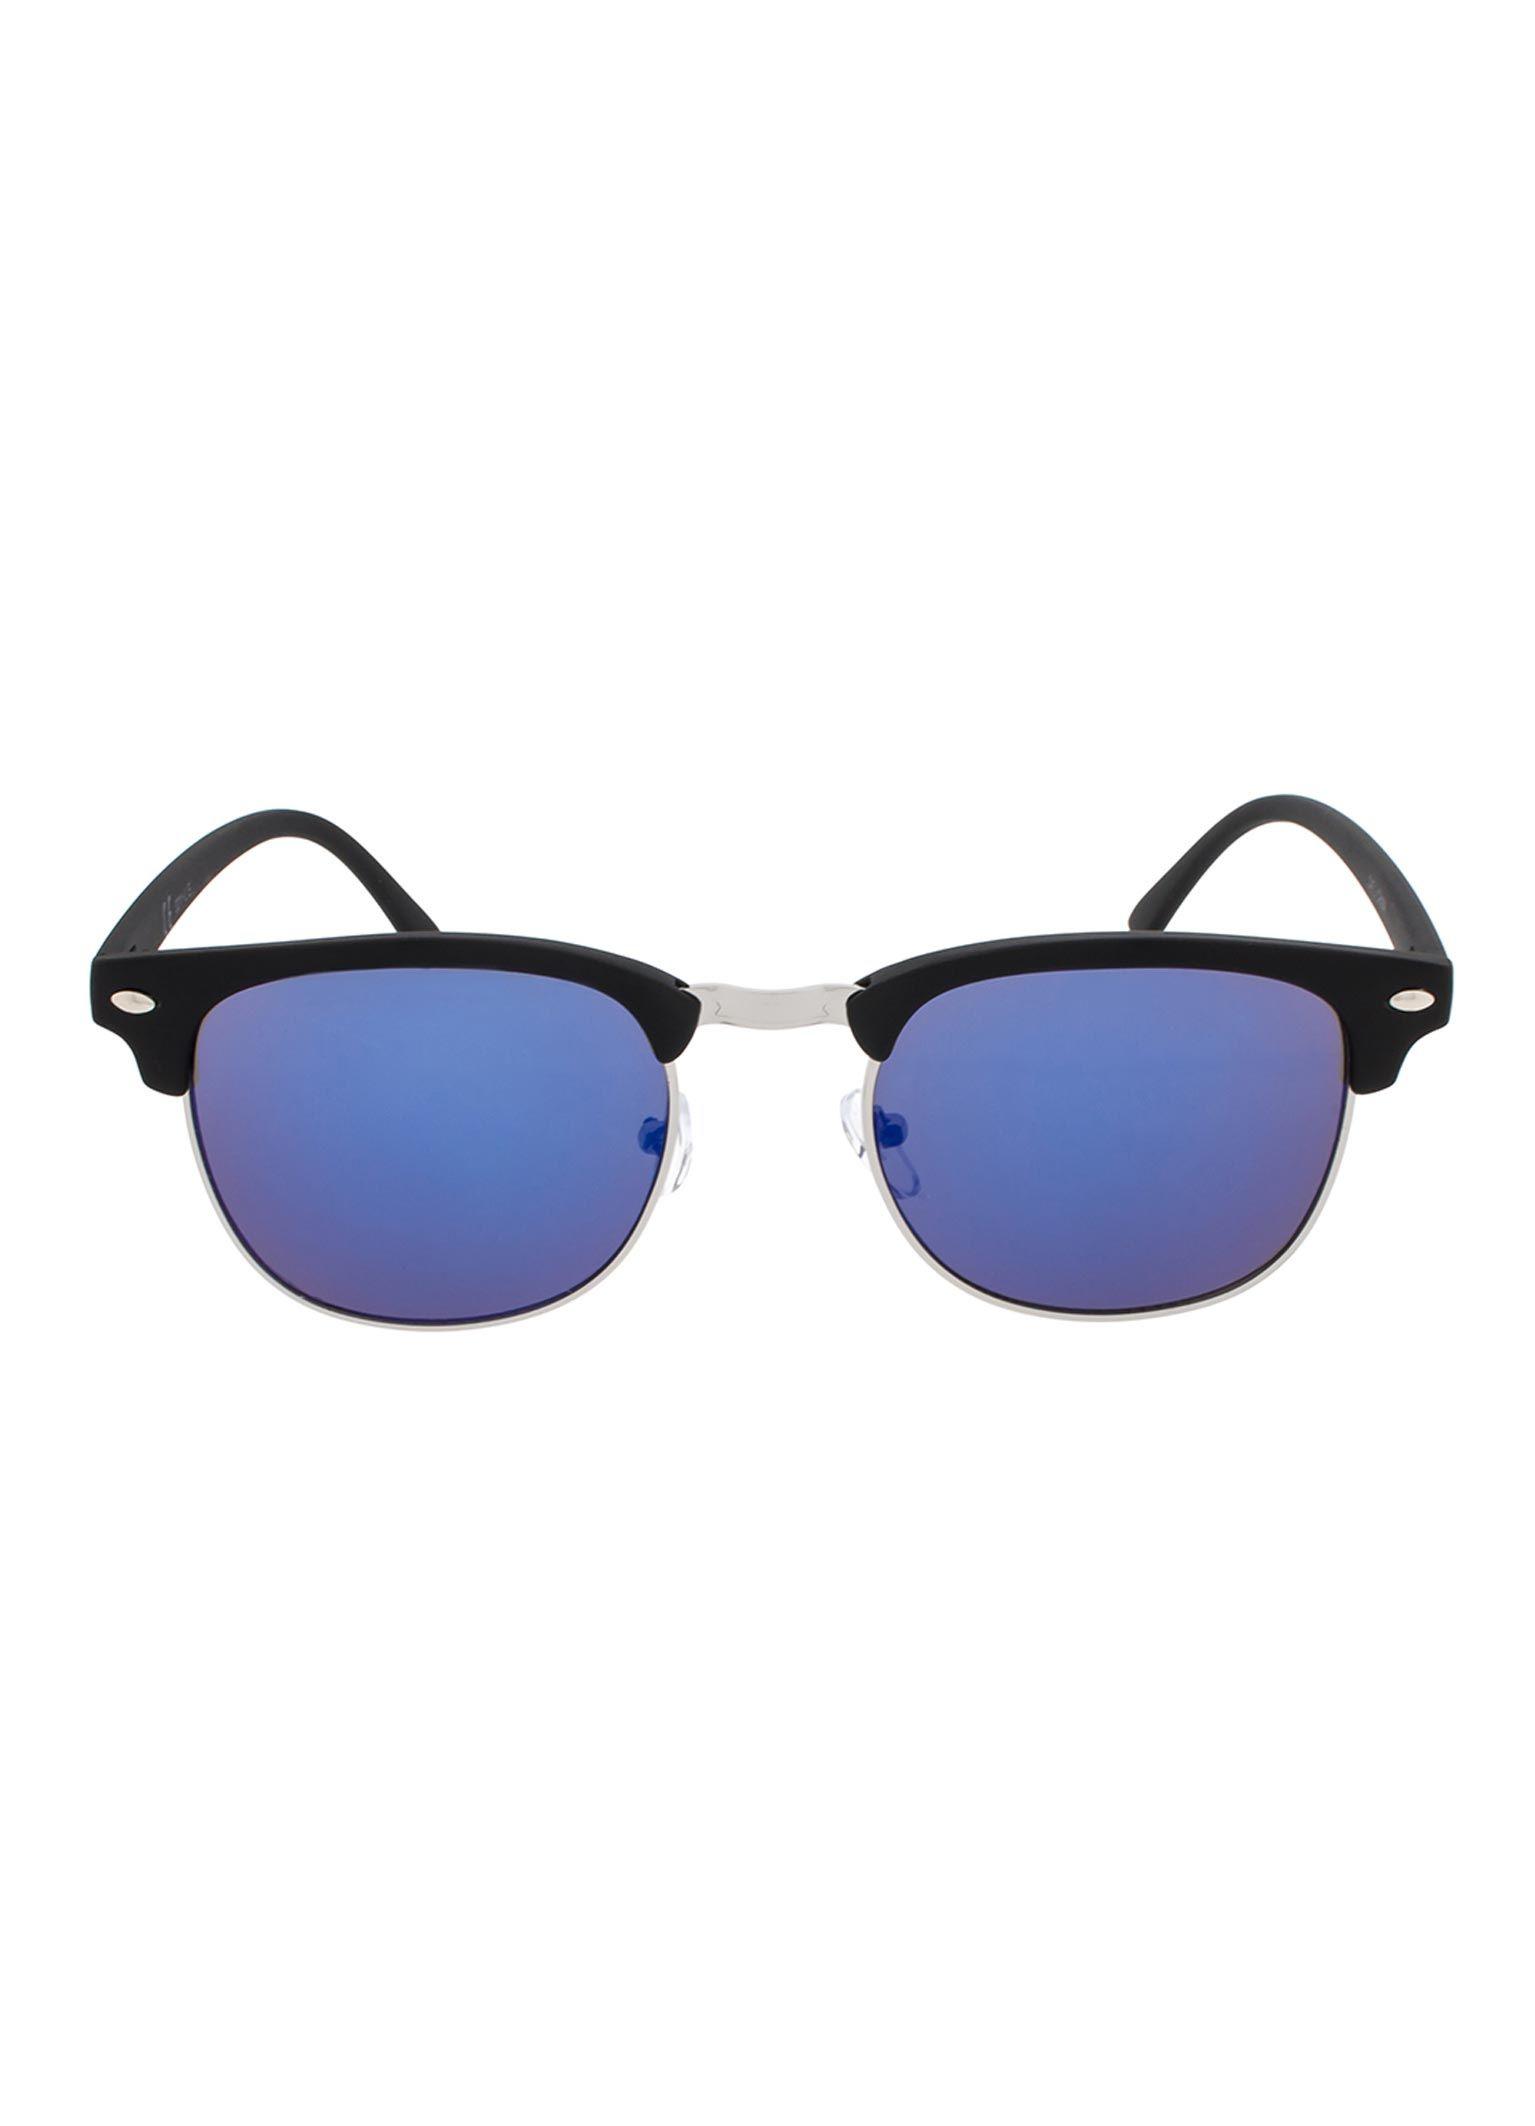 Afbeelding van Icon Eyewear 3211-L E Zonnebril Rubberized Black